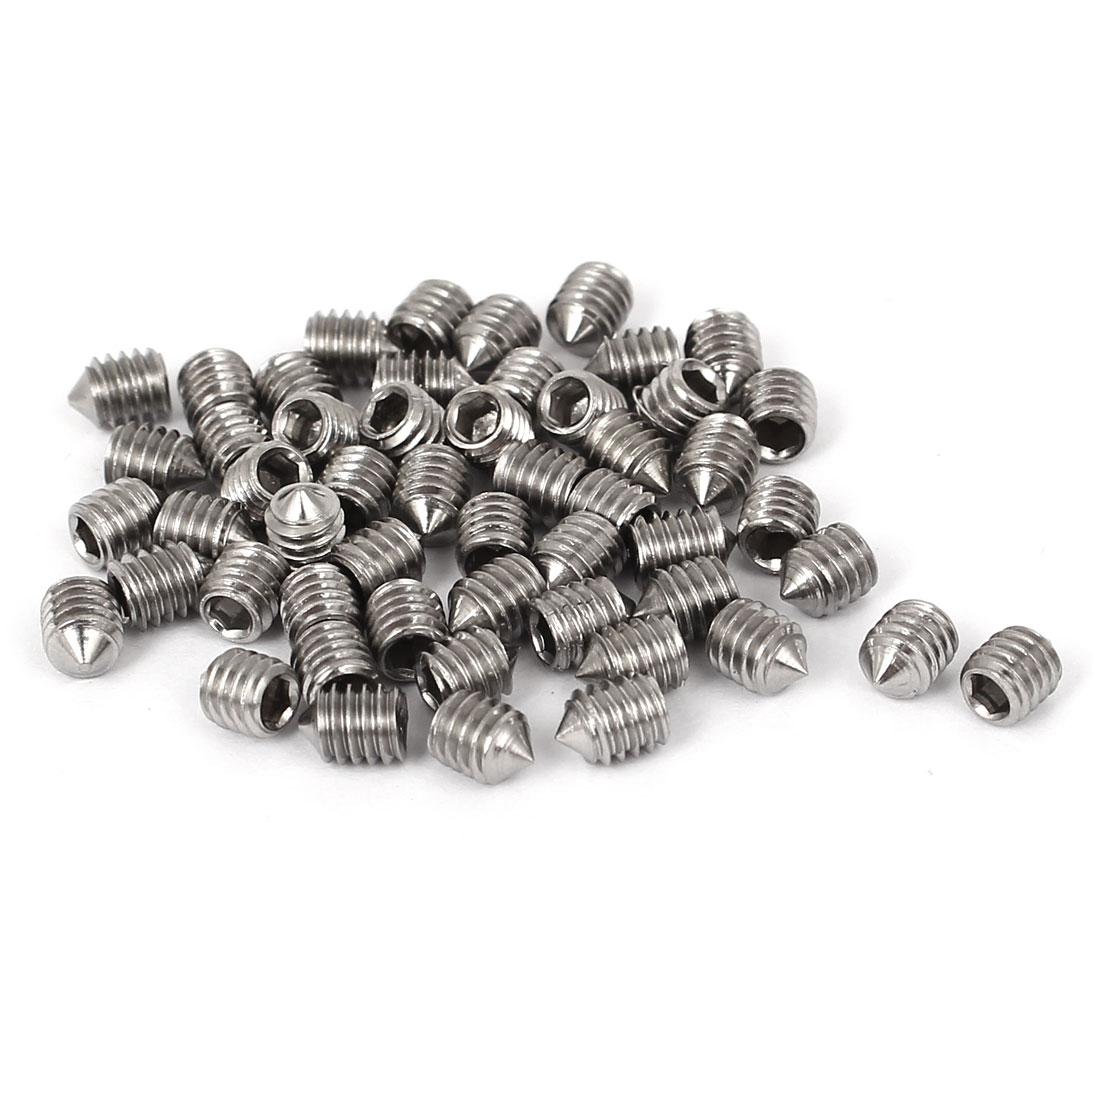 4mm x 5mm Thread 304 Stainless Steel Hex Socket Cone Point Grub Screws 50 Pcs